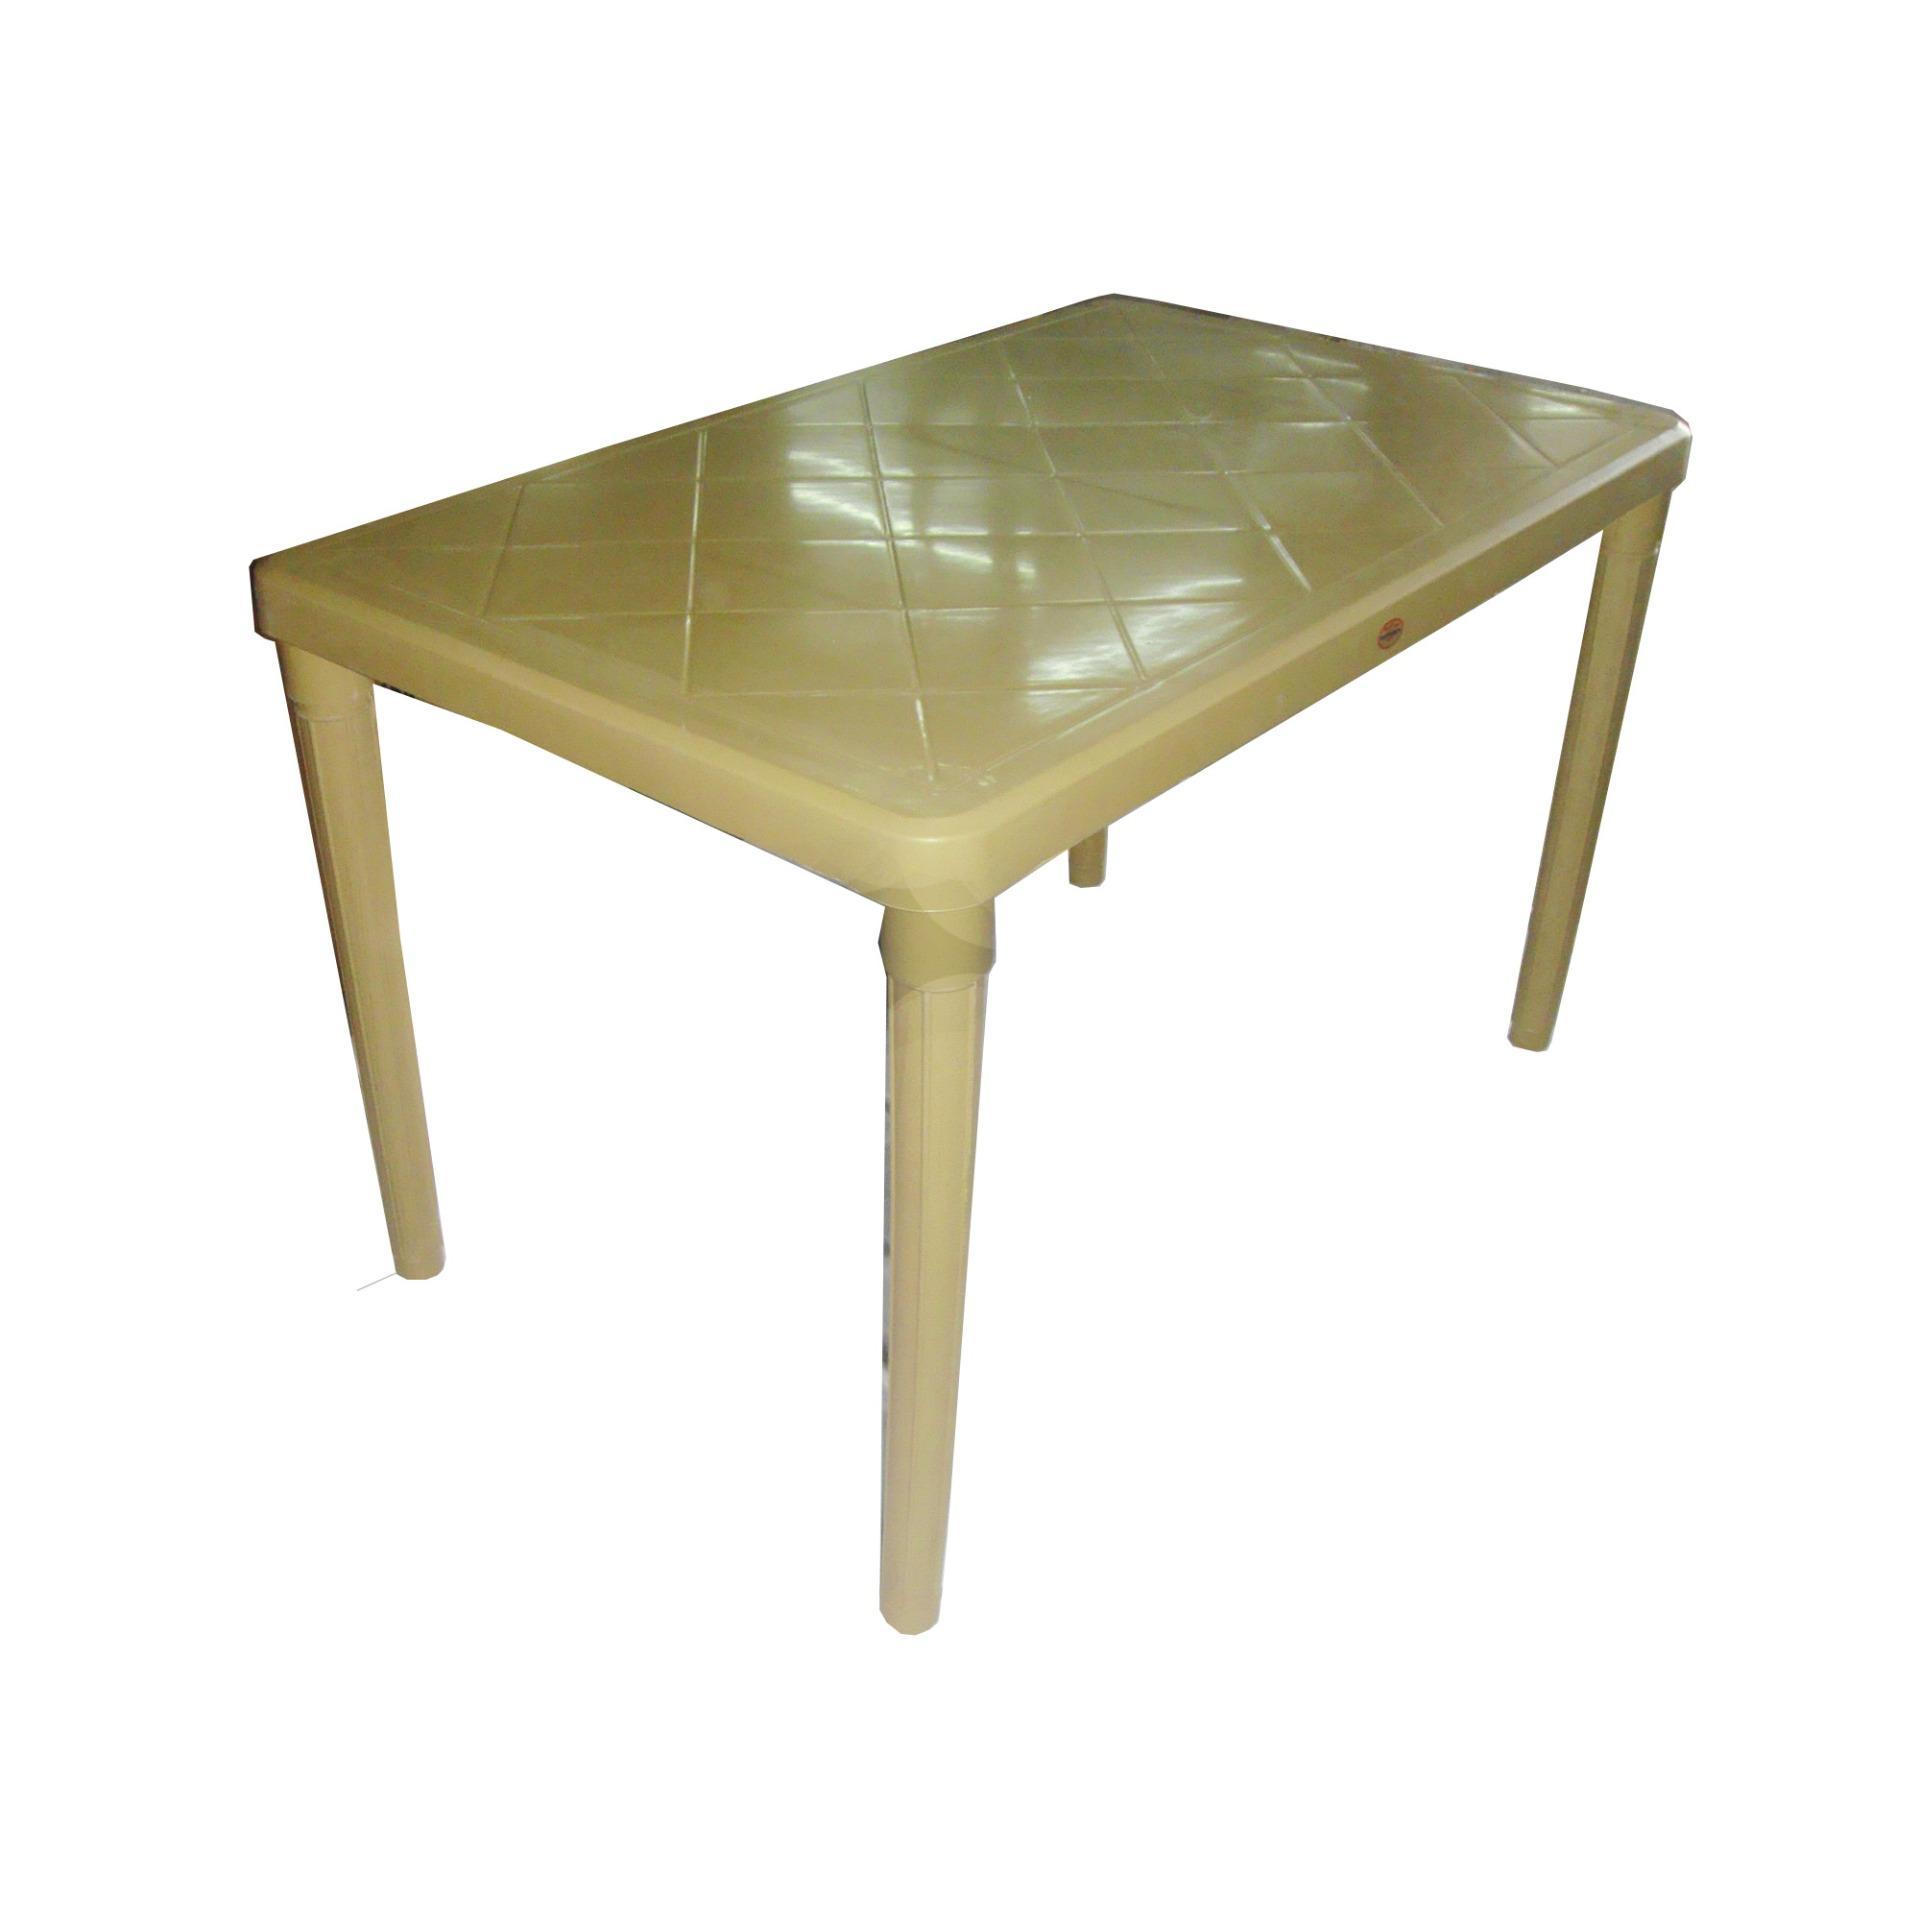 30X48 Germany Plastic Table Biege